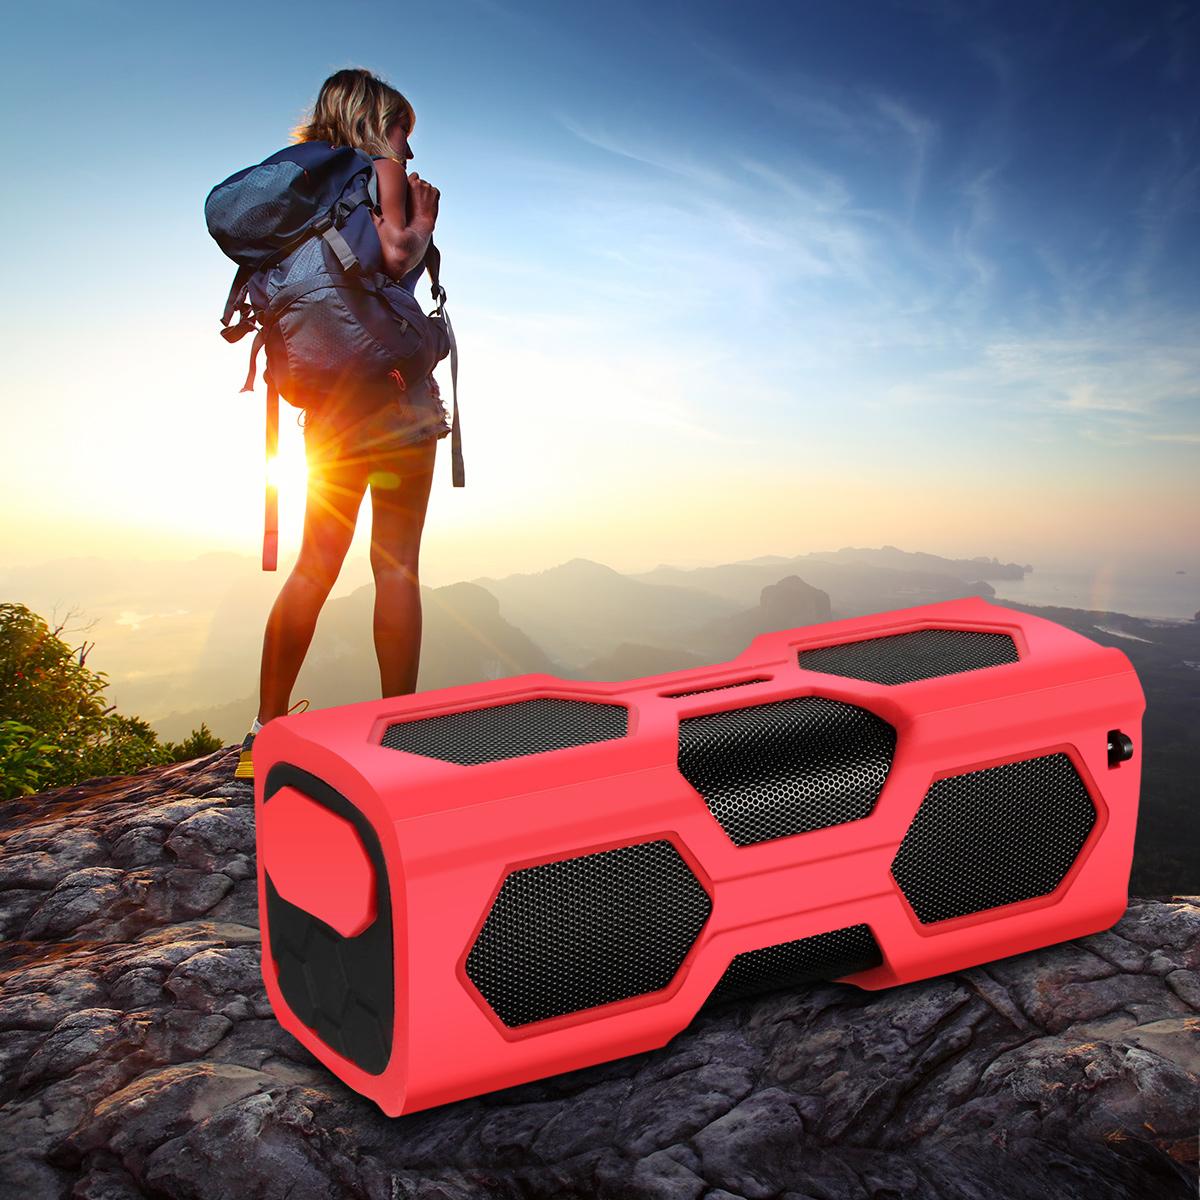 NFC Function 3600mAh Waterproof Wireless Bluetooth Speaker Portable Shockproof Speaker Ultra Bass Subwoofer Built-in Mic Power Bank with Metal Hook